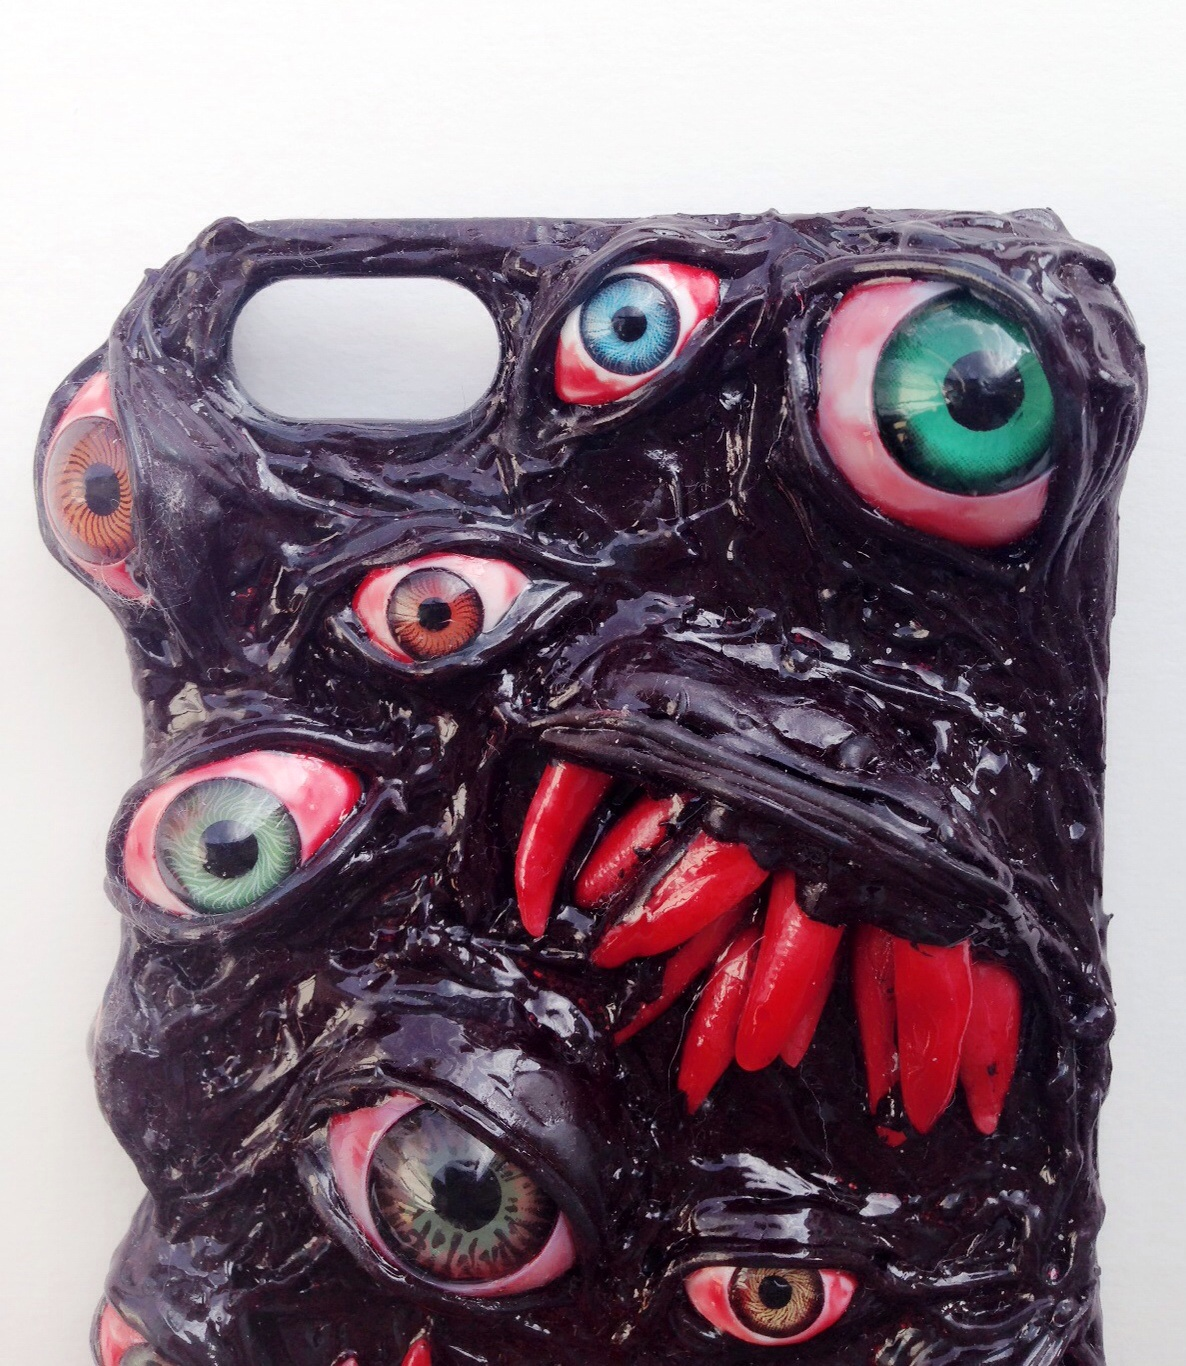 Handmade Decoden Phone Case Surreal Custom Horror Phone Case Eyeball Punk Psychohilly